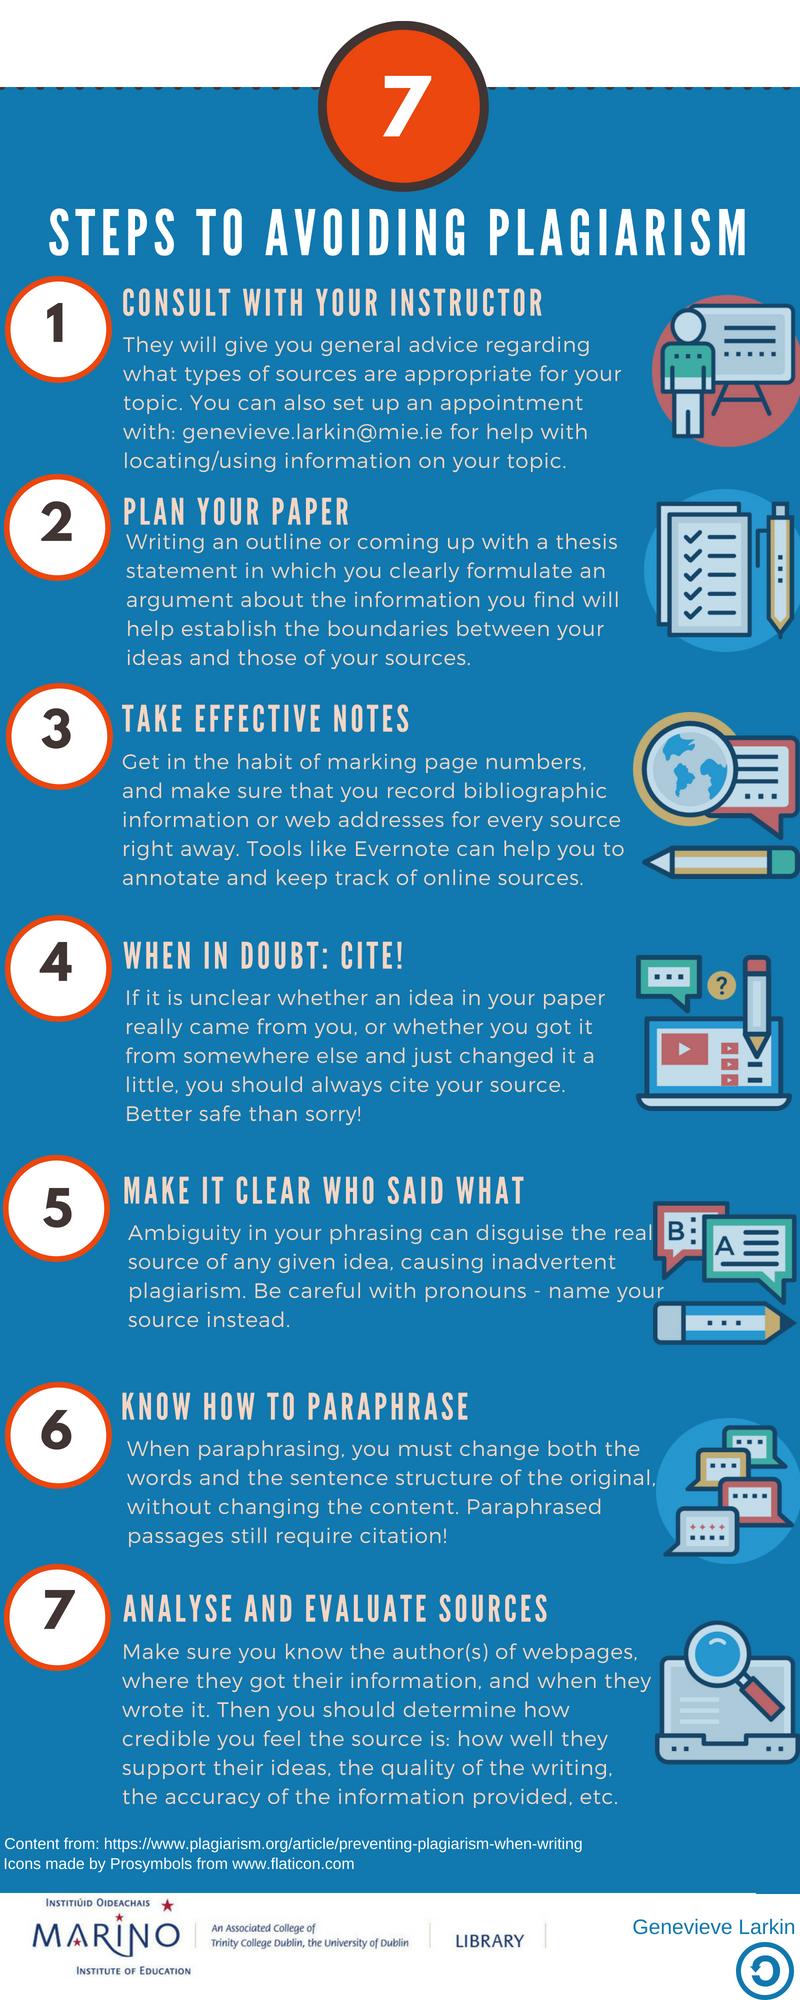 7 steps to avoiding plagiarism infogrpahic